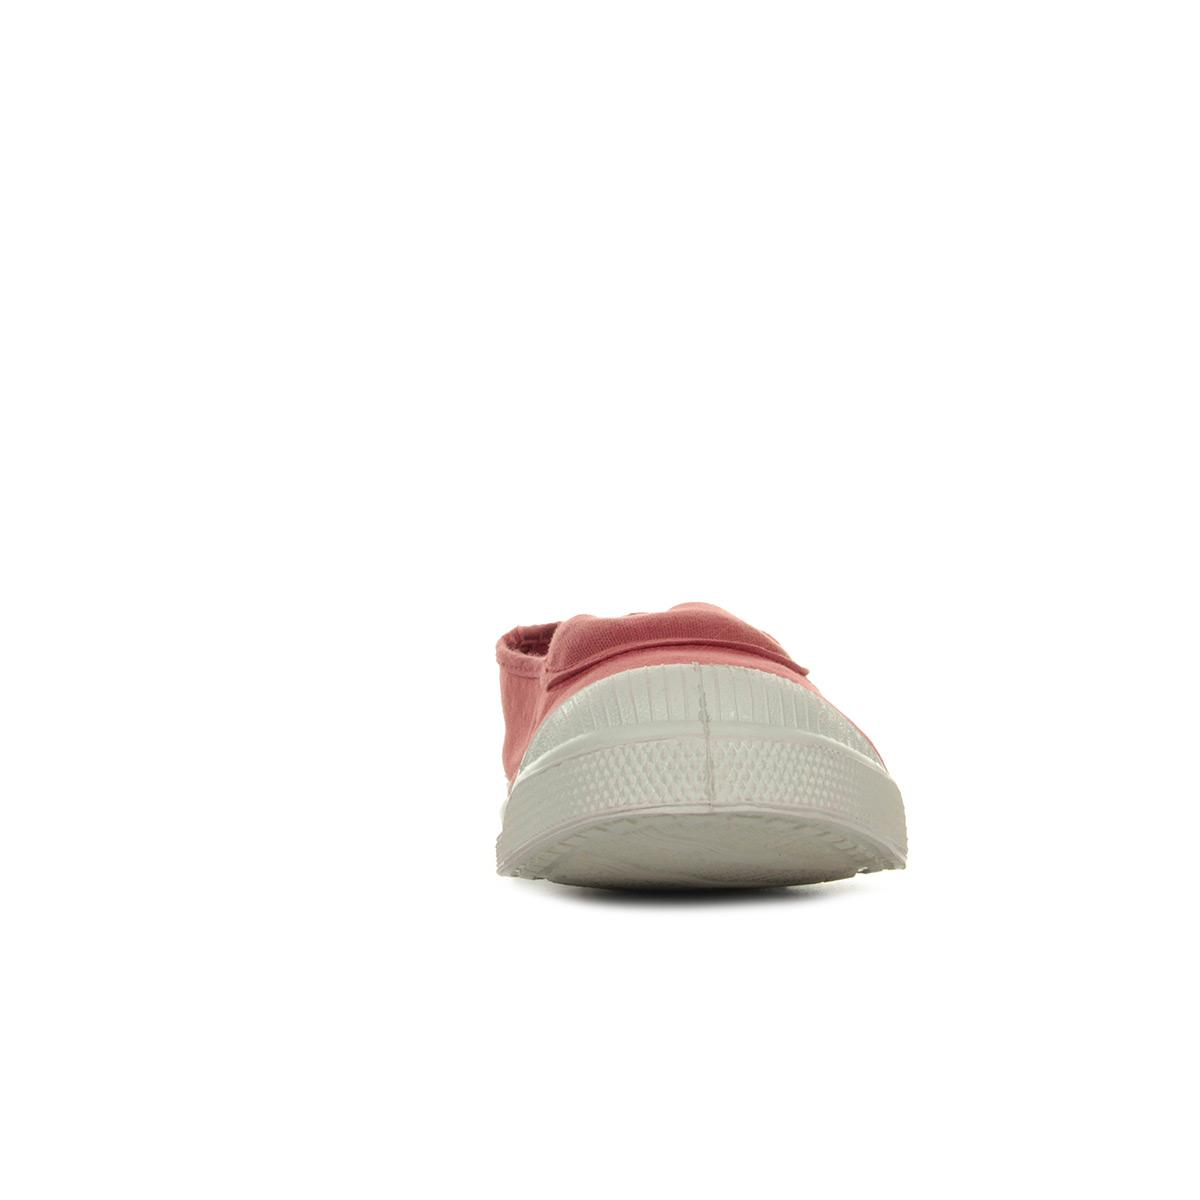 Bensimon Tennis Elastique Vieux Rose F15002C15B437, Baskets mode femme